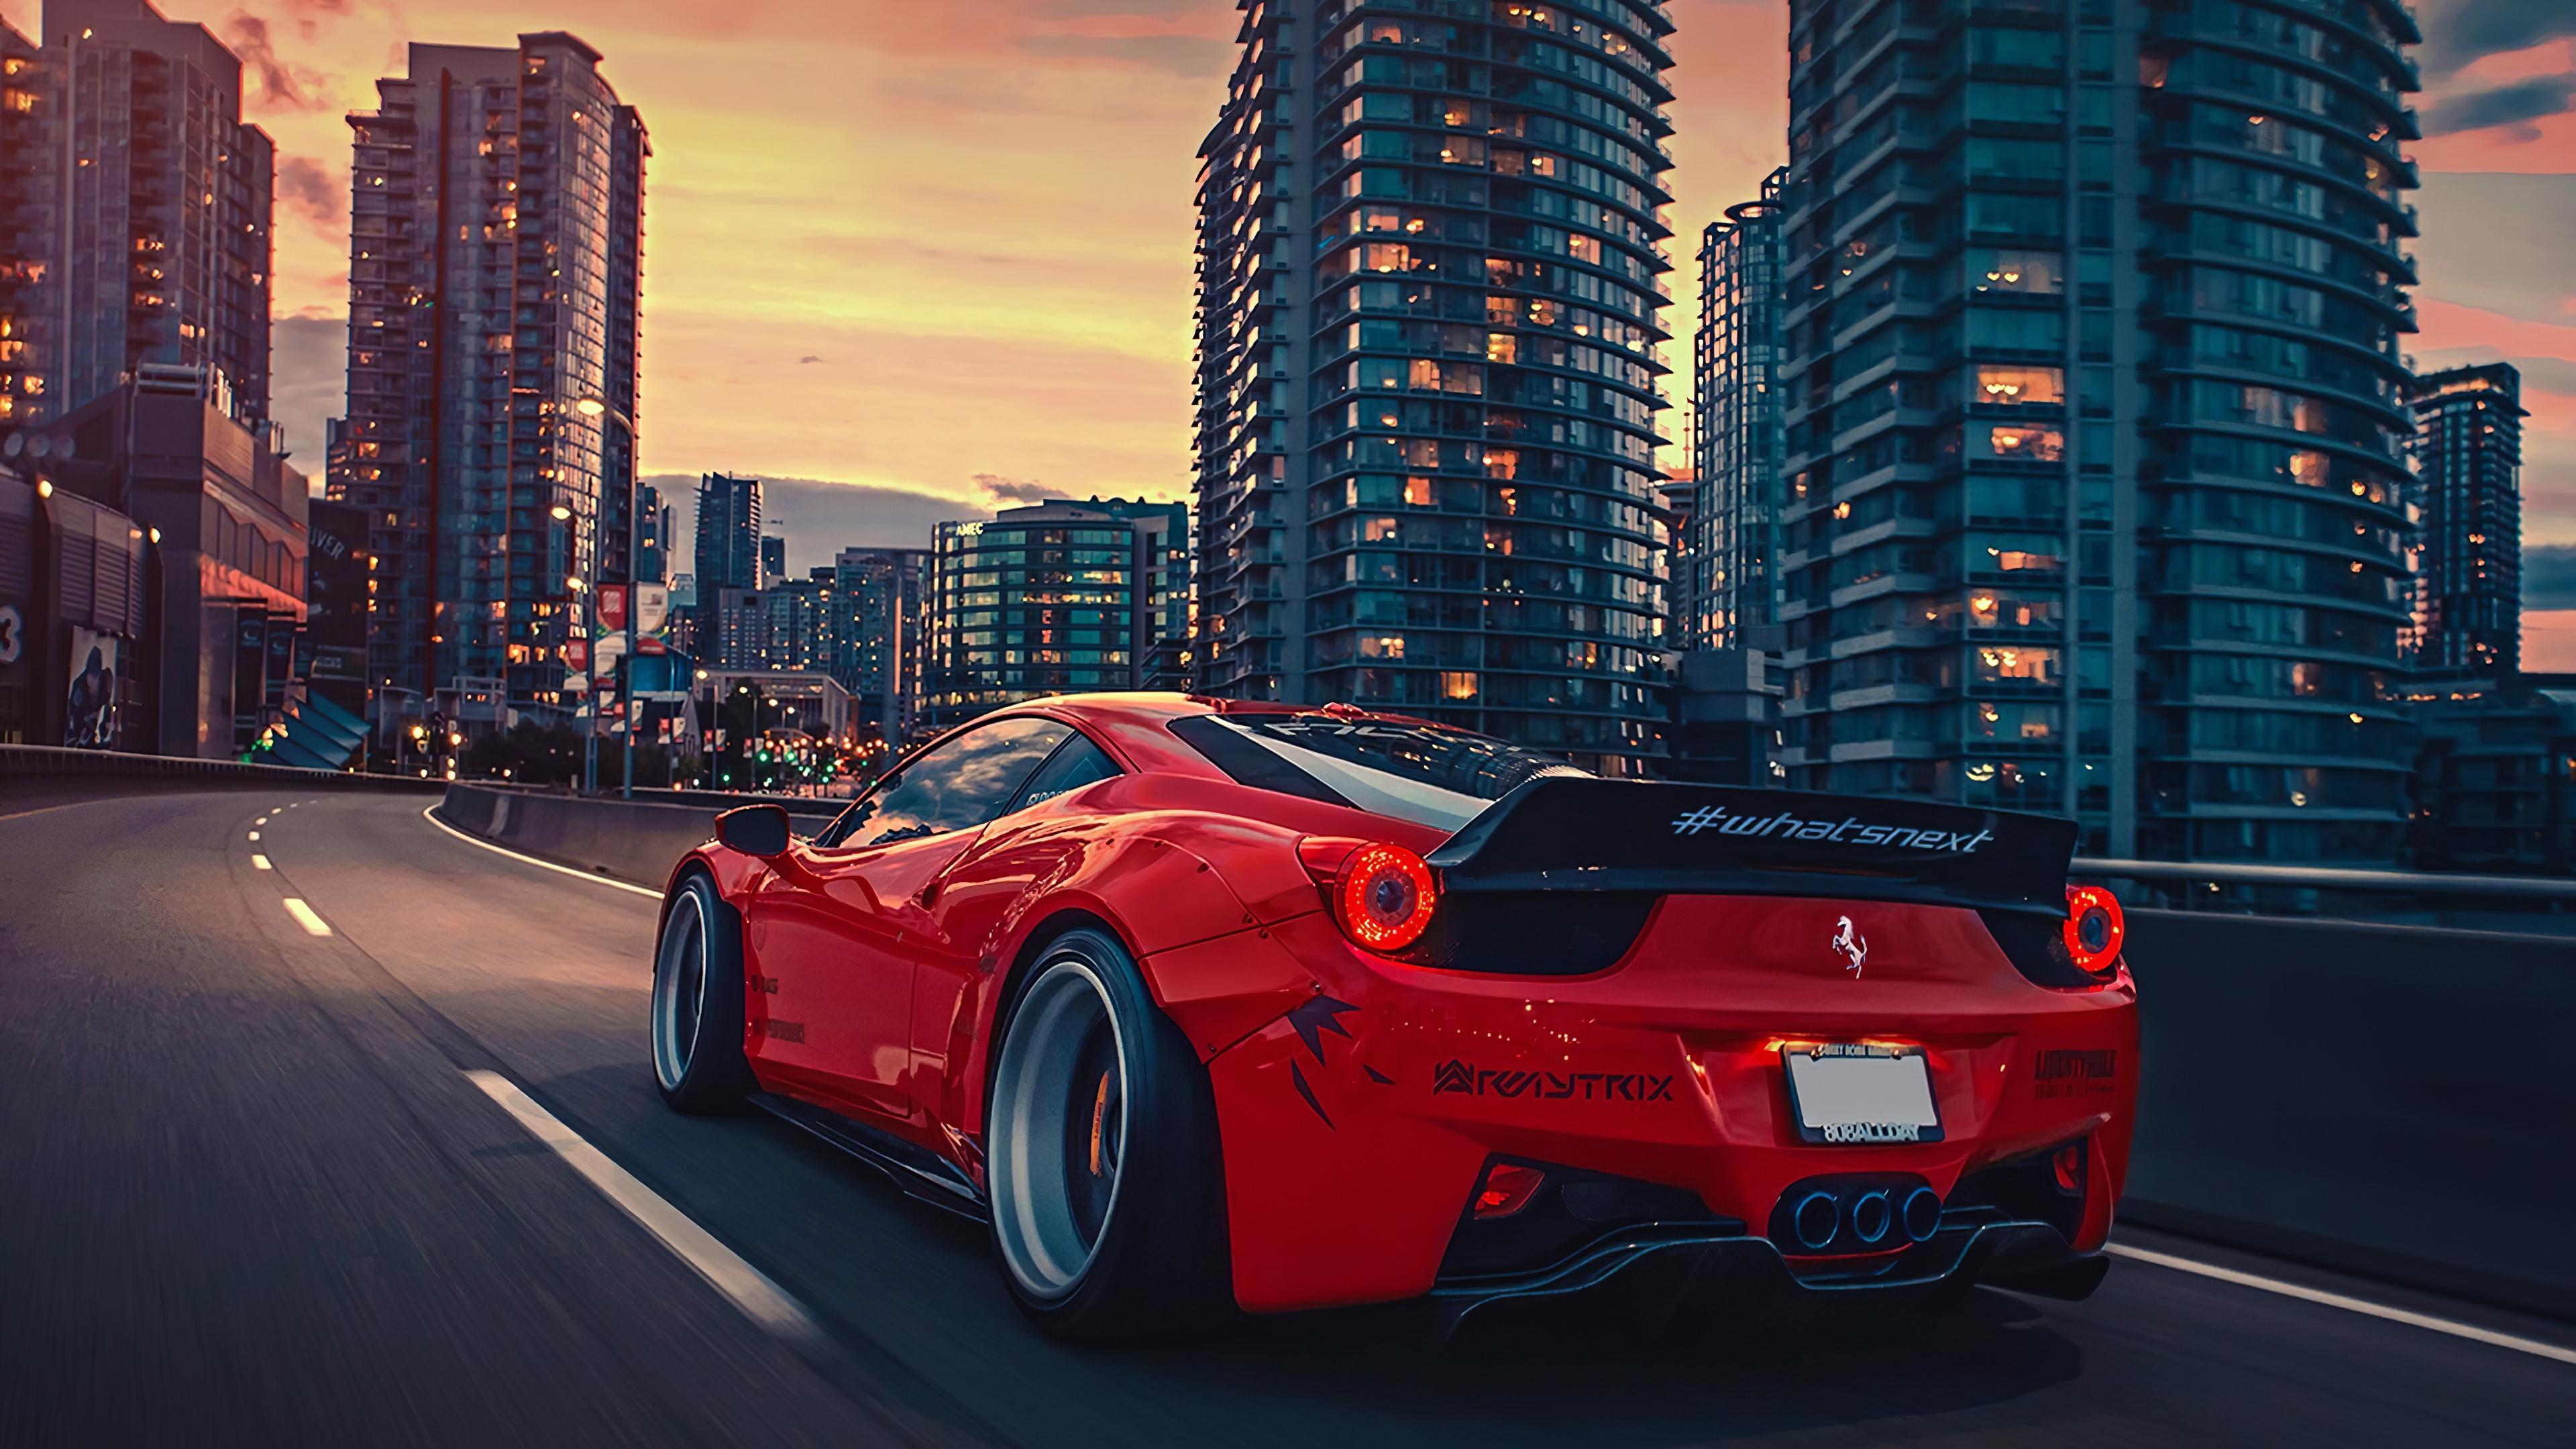 ferrari 458 city 4k 1556185258 - Ferrari 458 City 4k - hd-wallpapers, ferrari wallpapers, ferrari 458 wallpapers, cars wallpapers, 4k-wallpapers